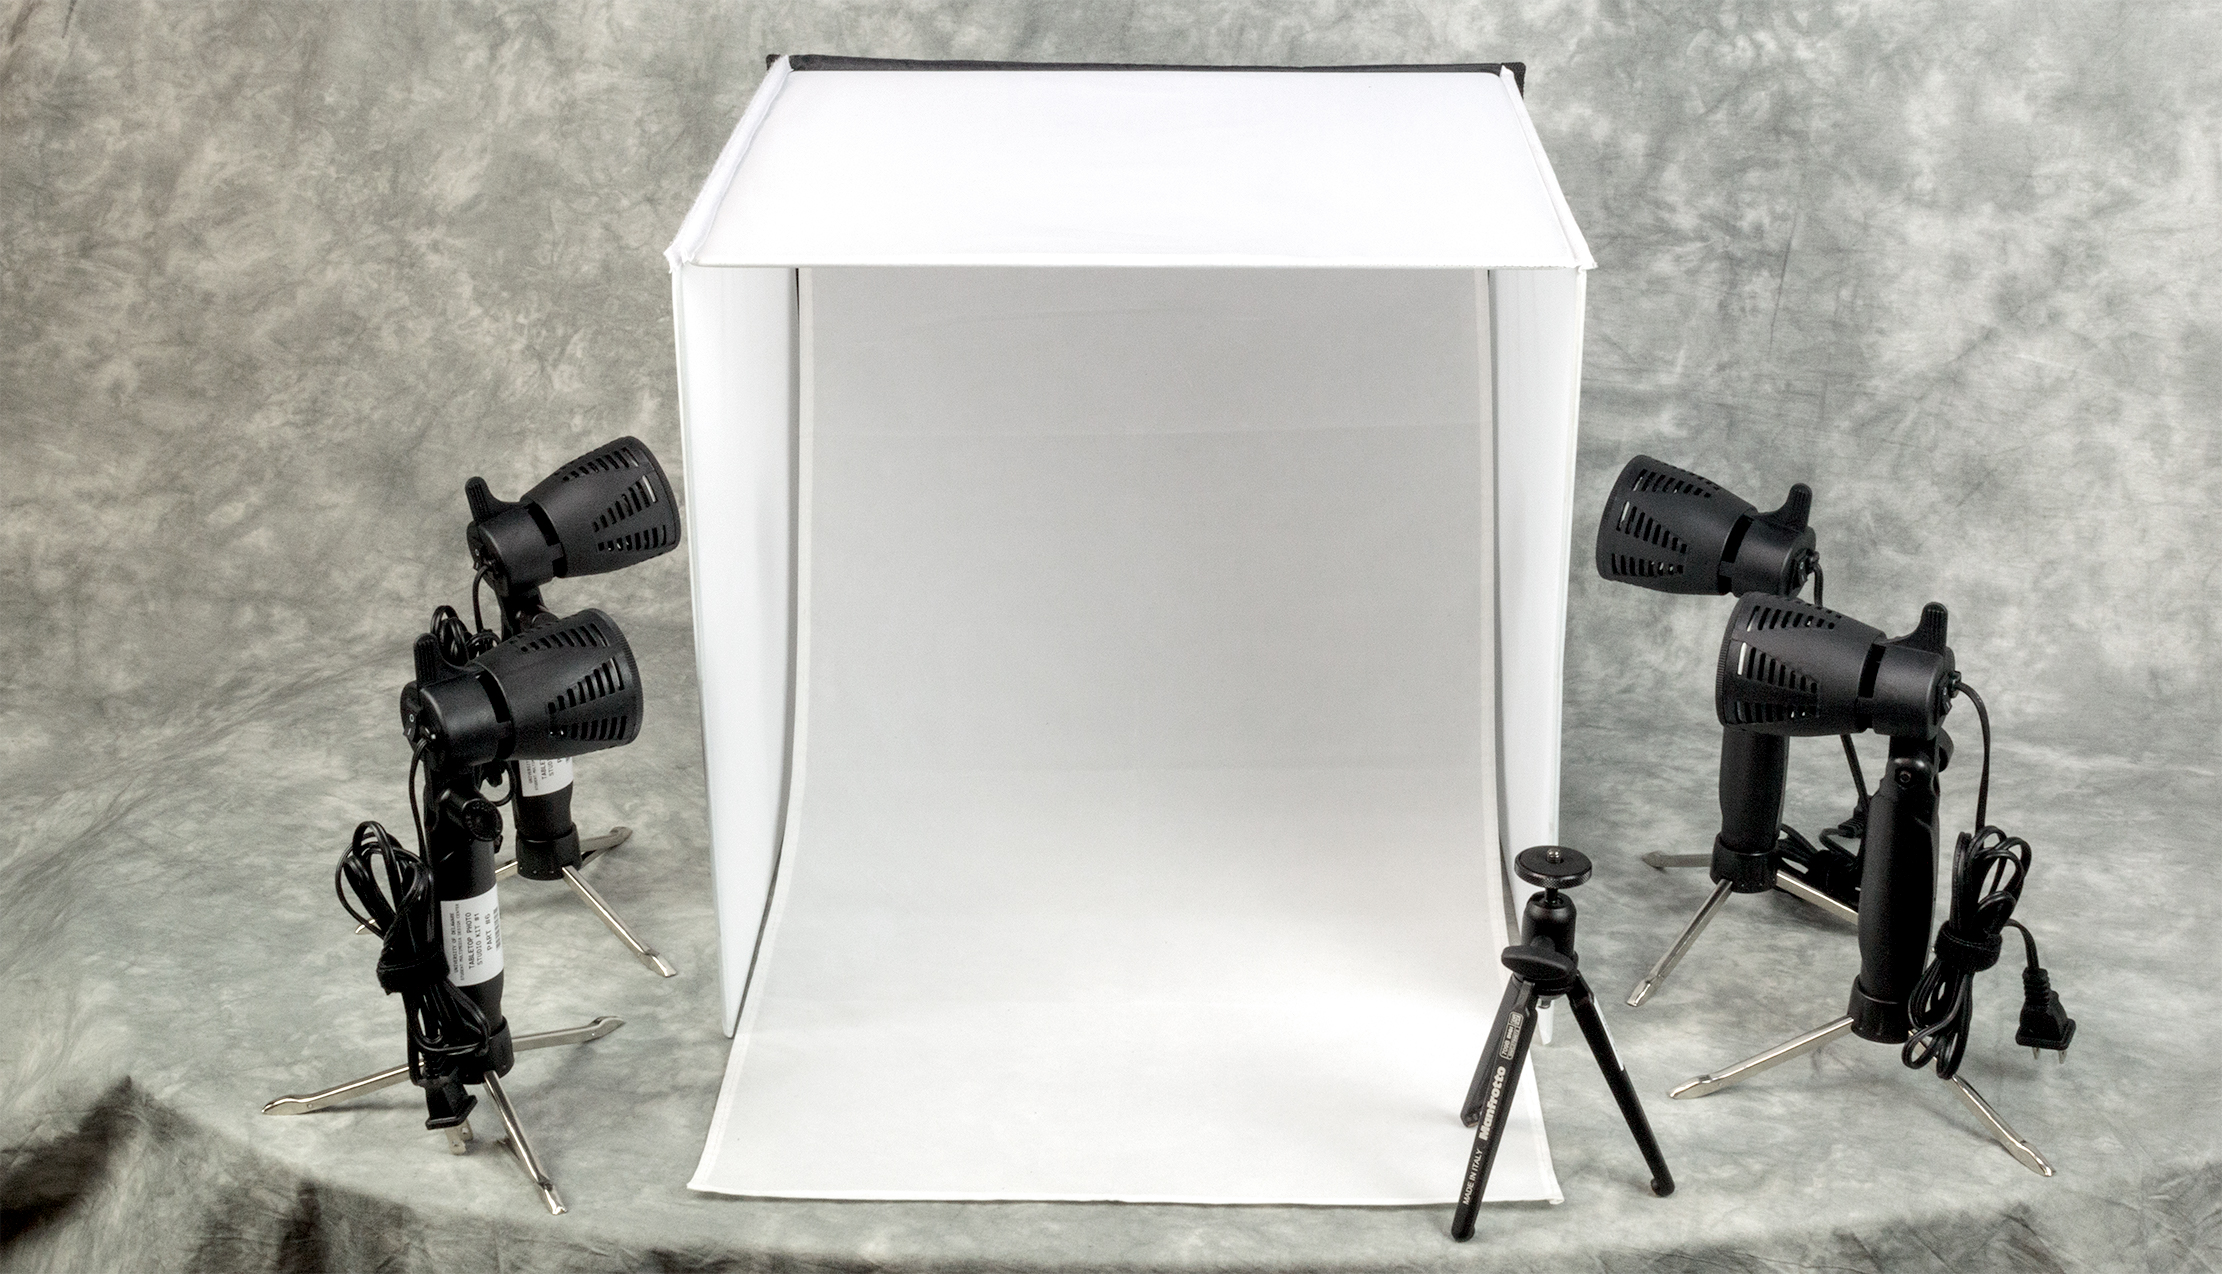 Tabletop Photo Studio Kit Photo